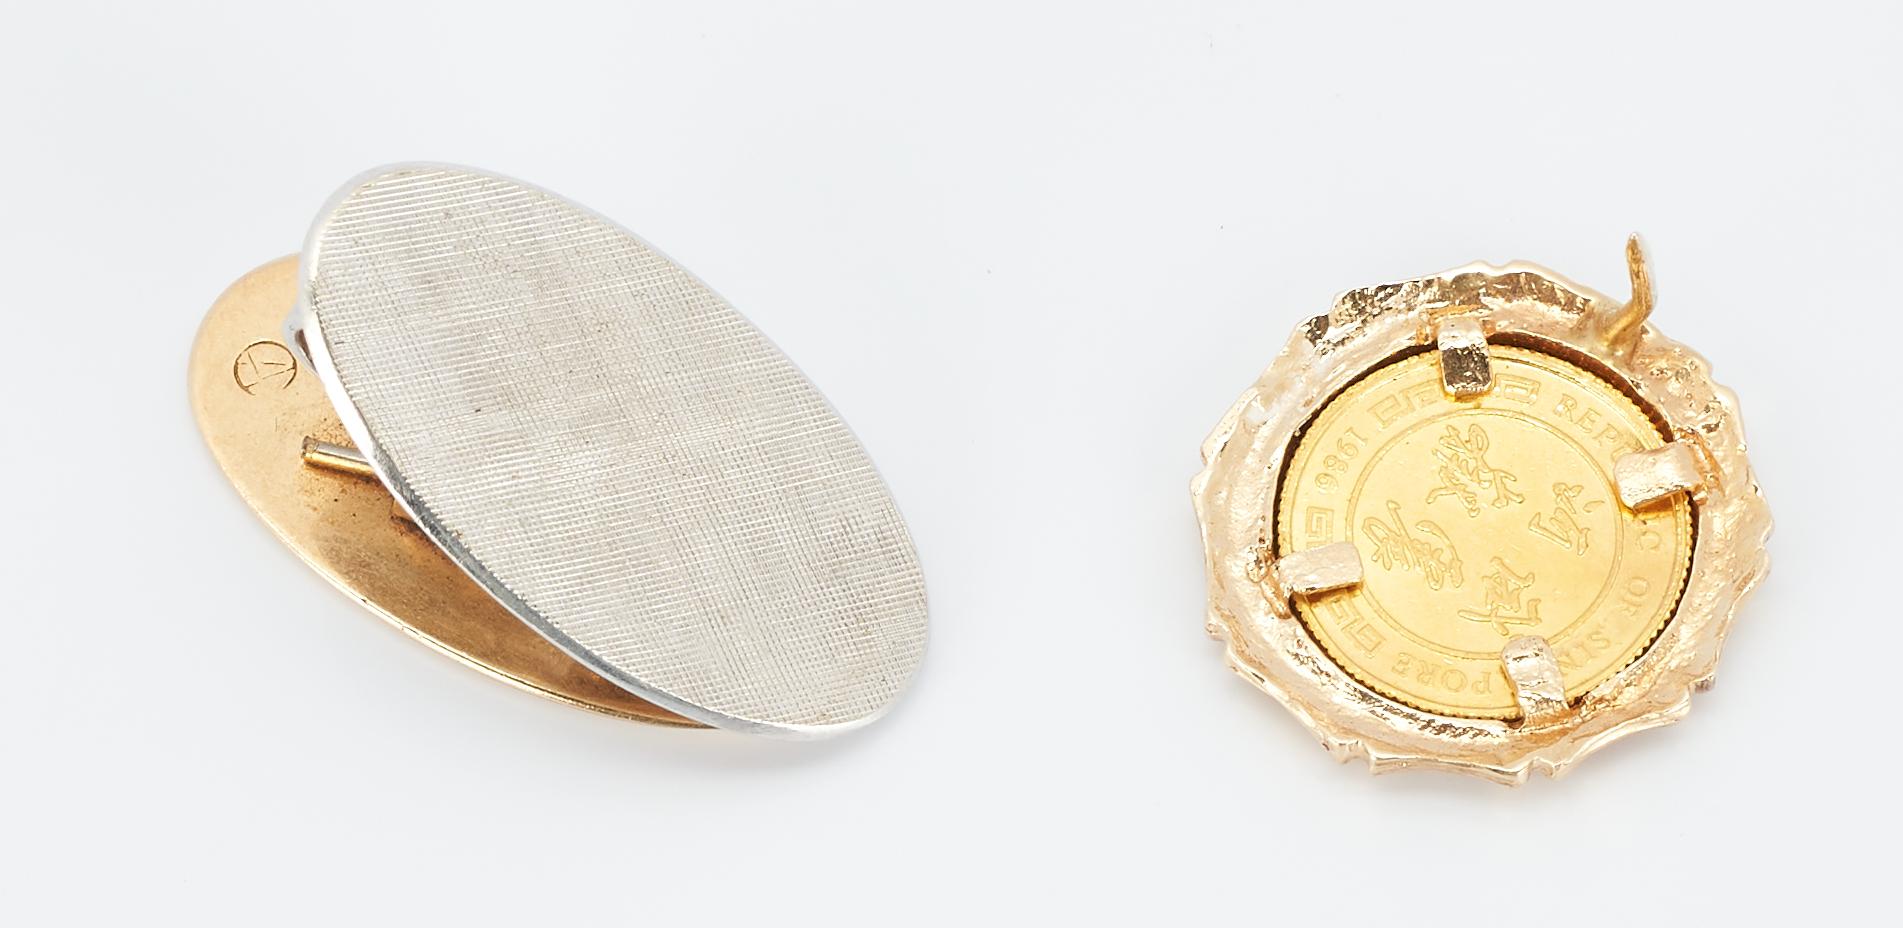 Lot 857: 14K Gold Tie Tack, Collar Stays & Money Clip